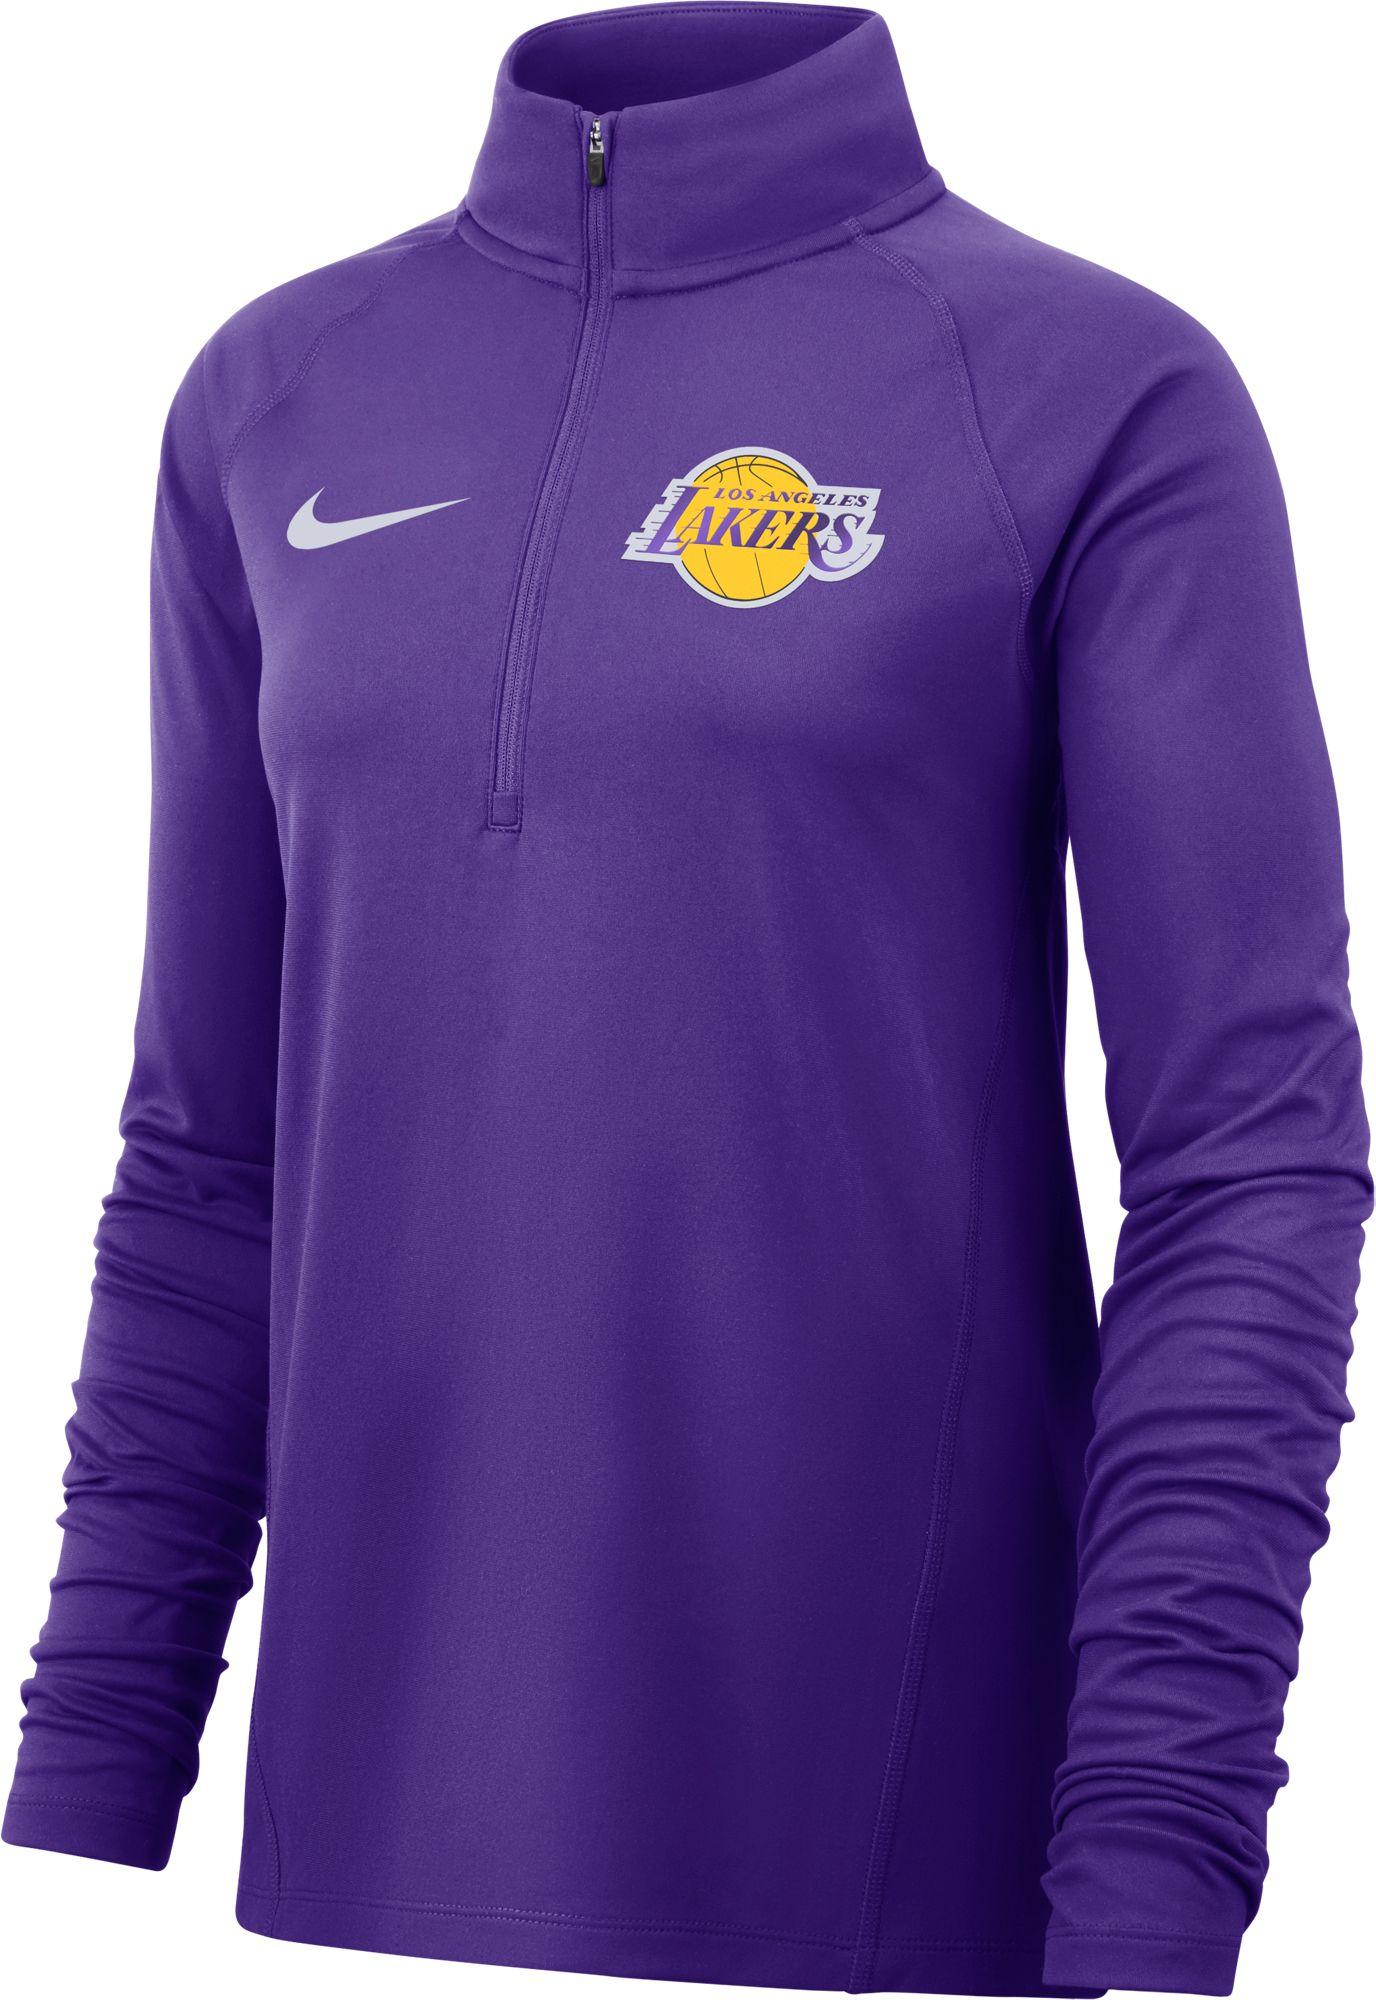 40760724e Nike Women's Los Angeles Lakers Dri-FIT Element Half-Zip Pullover ...